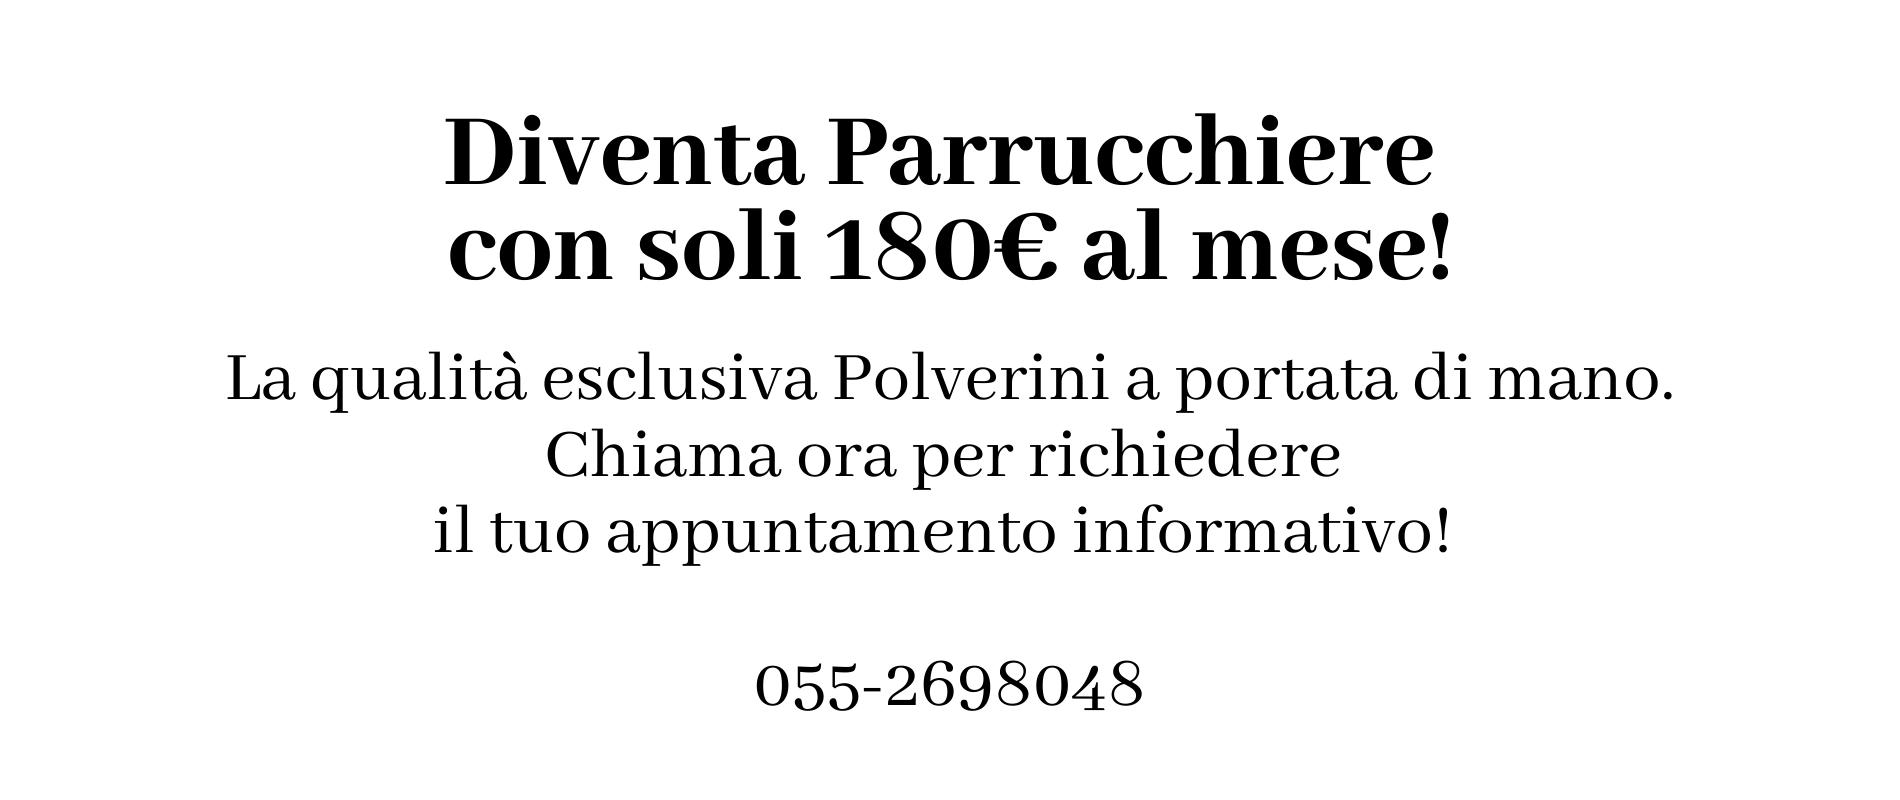 https://www.polverinihairacademia.com/wp-content/uploads/2019/12/Polverini1-1900x800.png